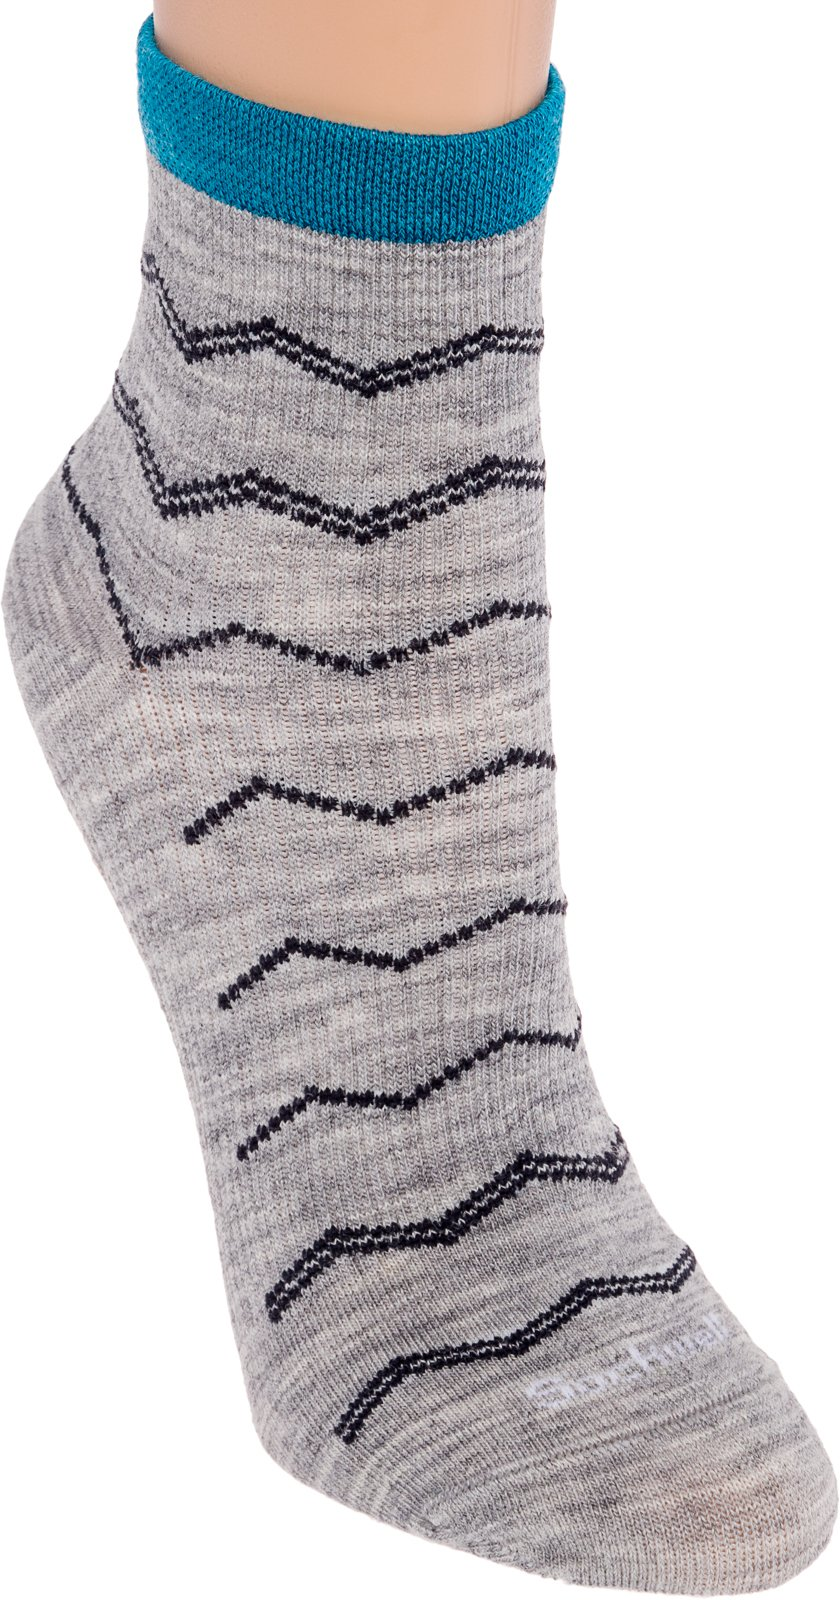 76ef37eb34 Sockwell Women's Plantar Fasciitis Firm Compression Socks, Plantar Quarter  Grey, Medium/Large